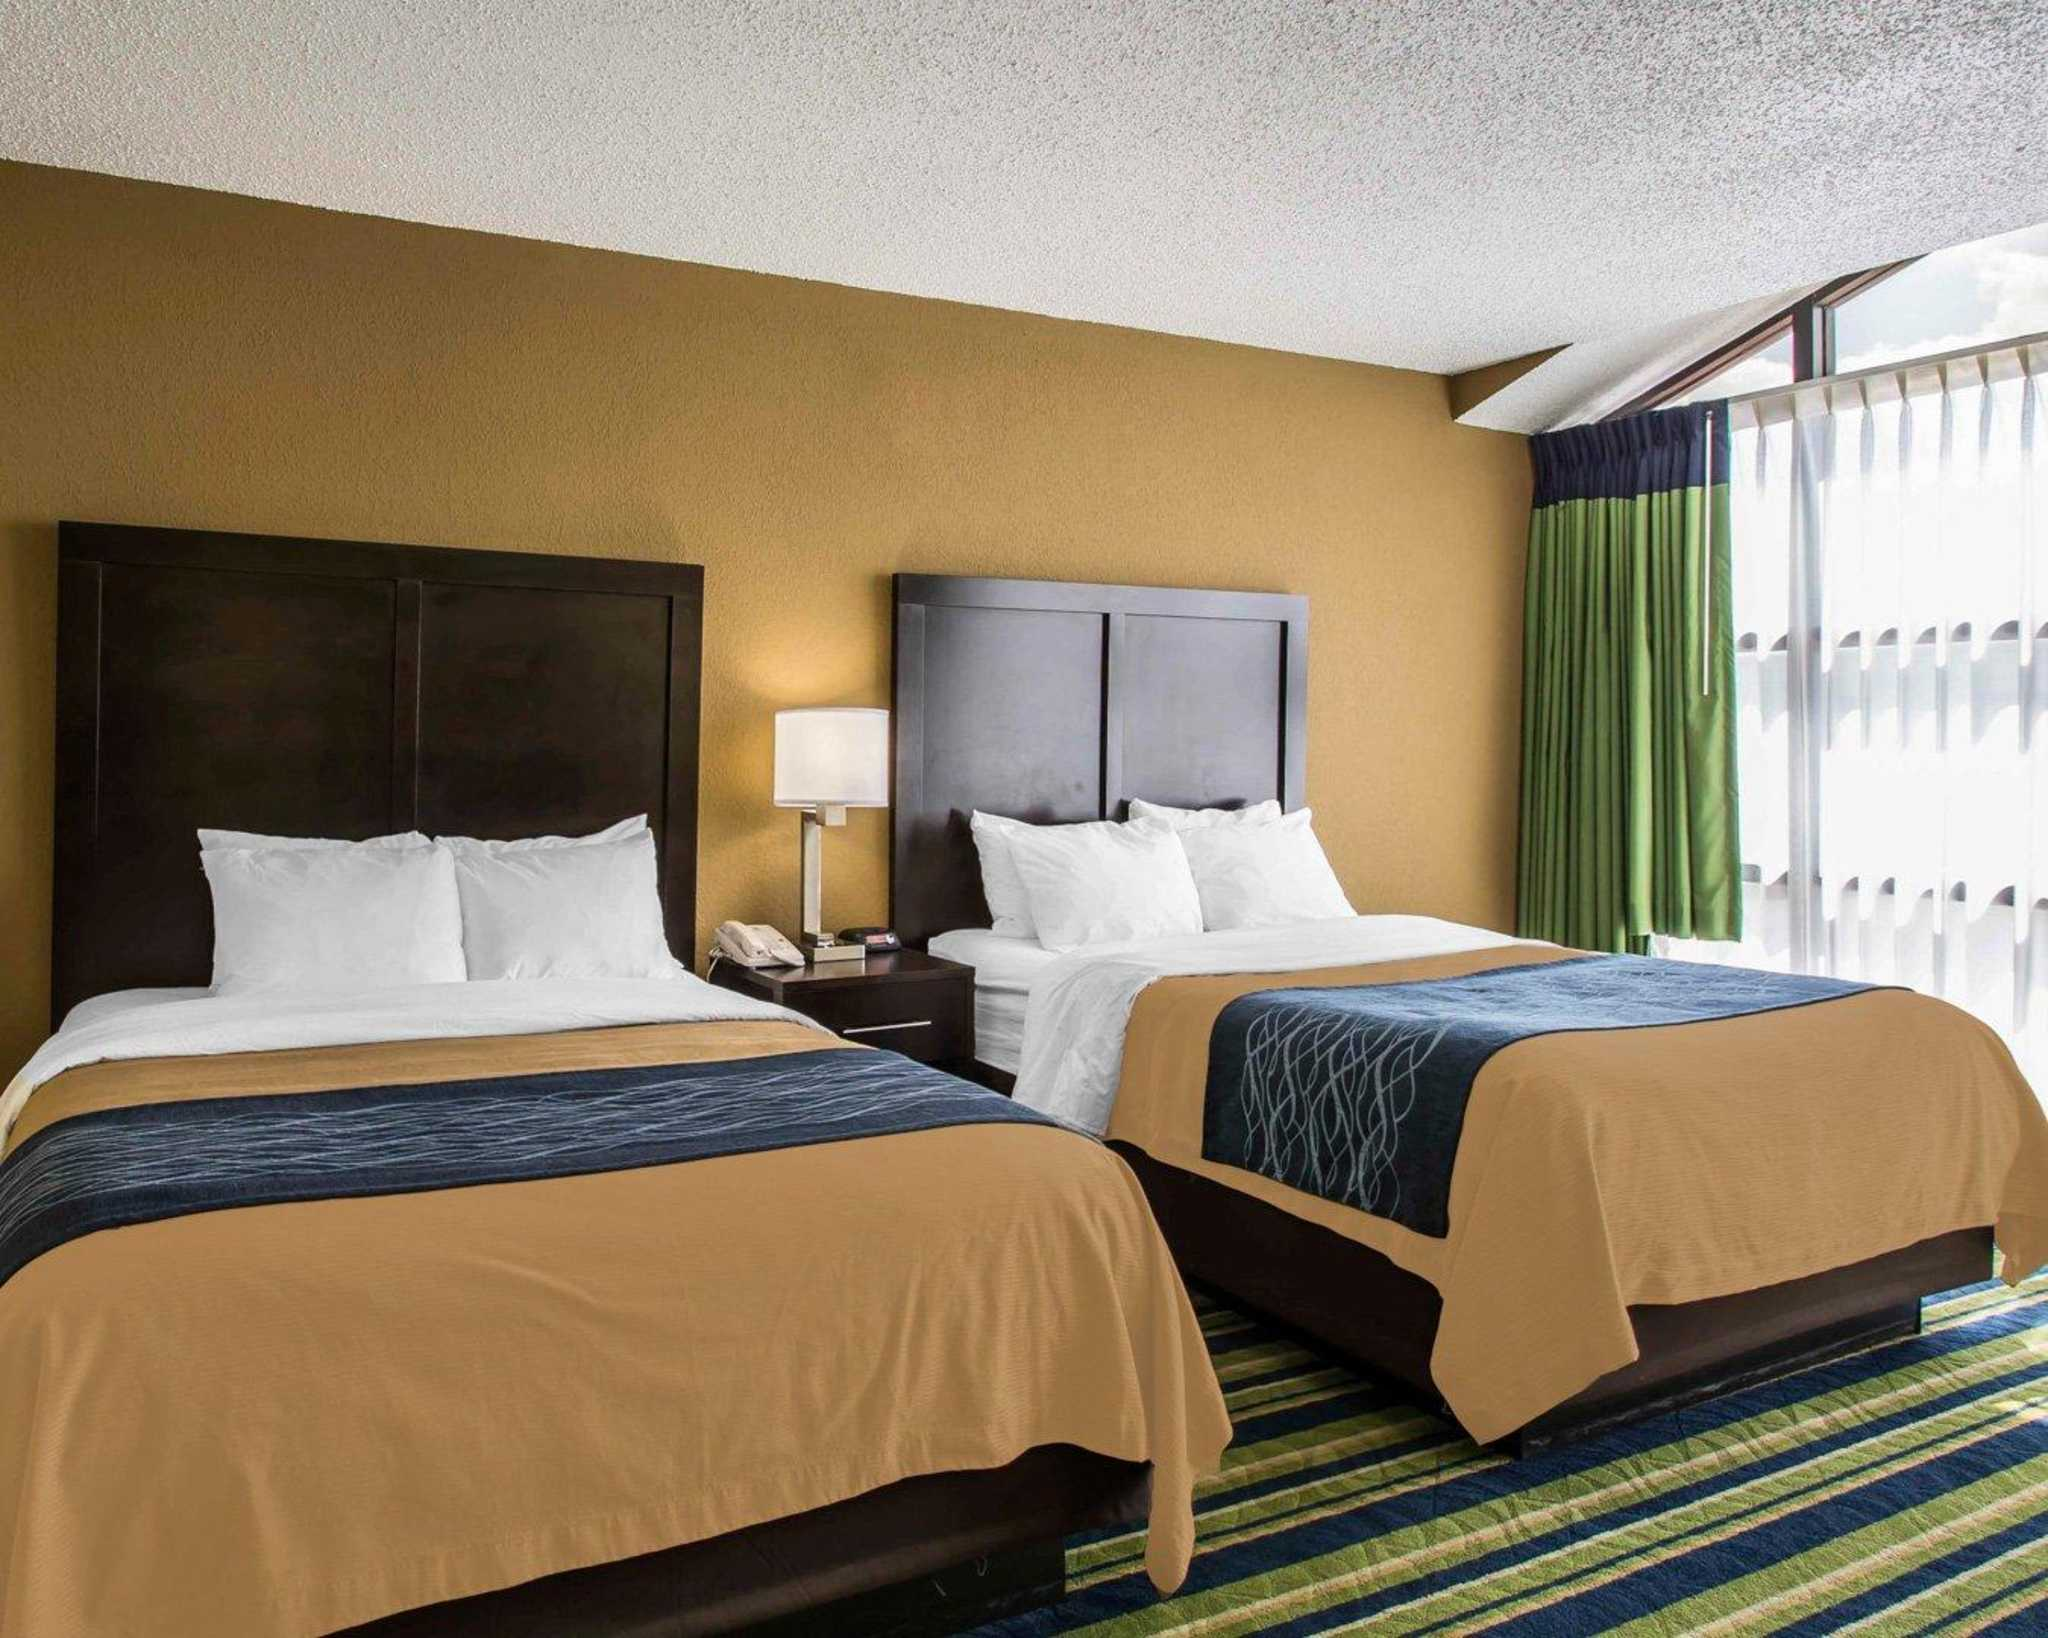 Comfort Inn & Suites Lantana - West Palm Beach South image 8